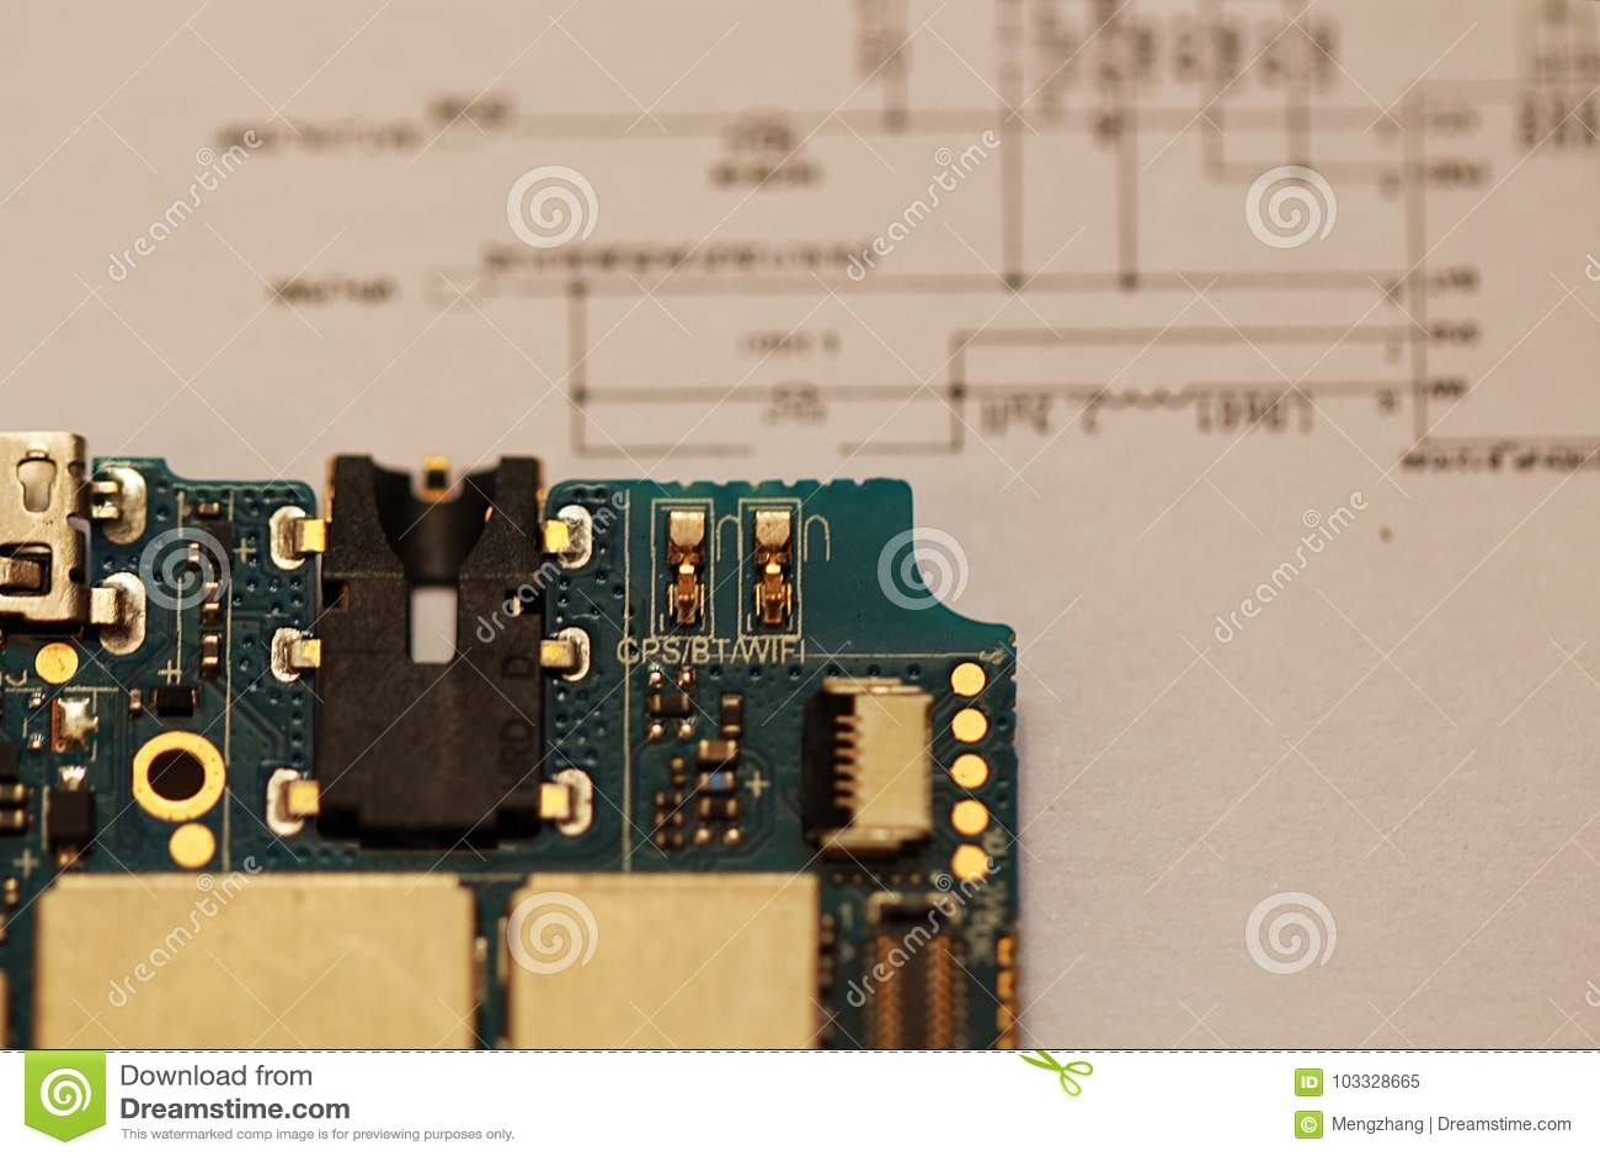 hight resolution of printed circuit board circuit diagram software